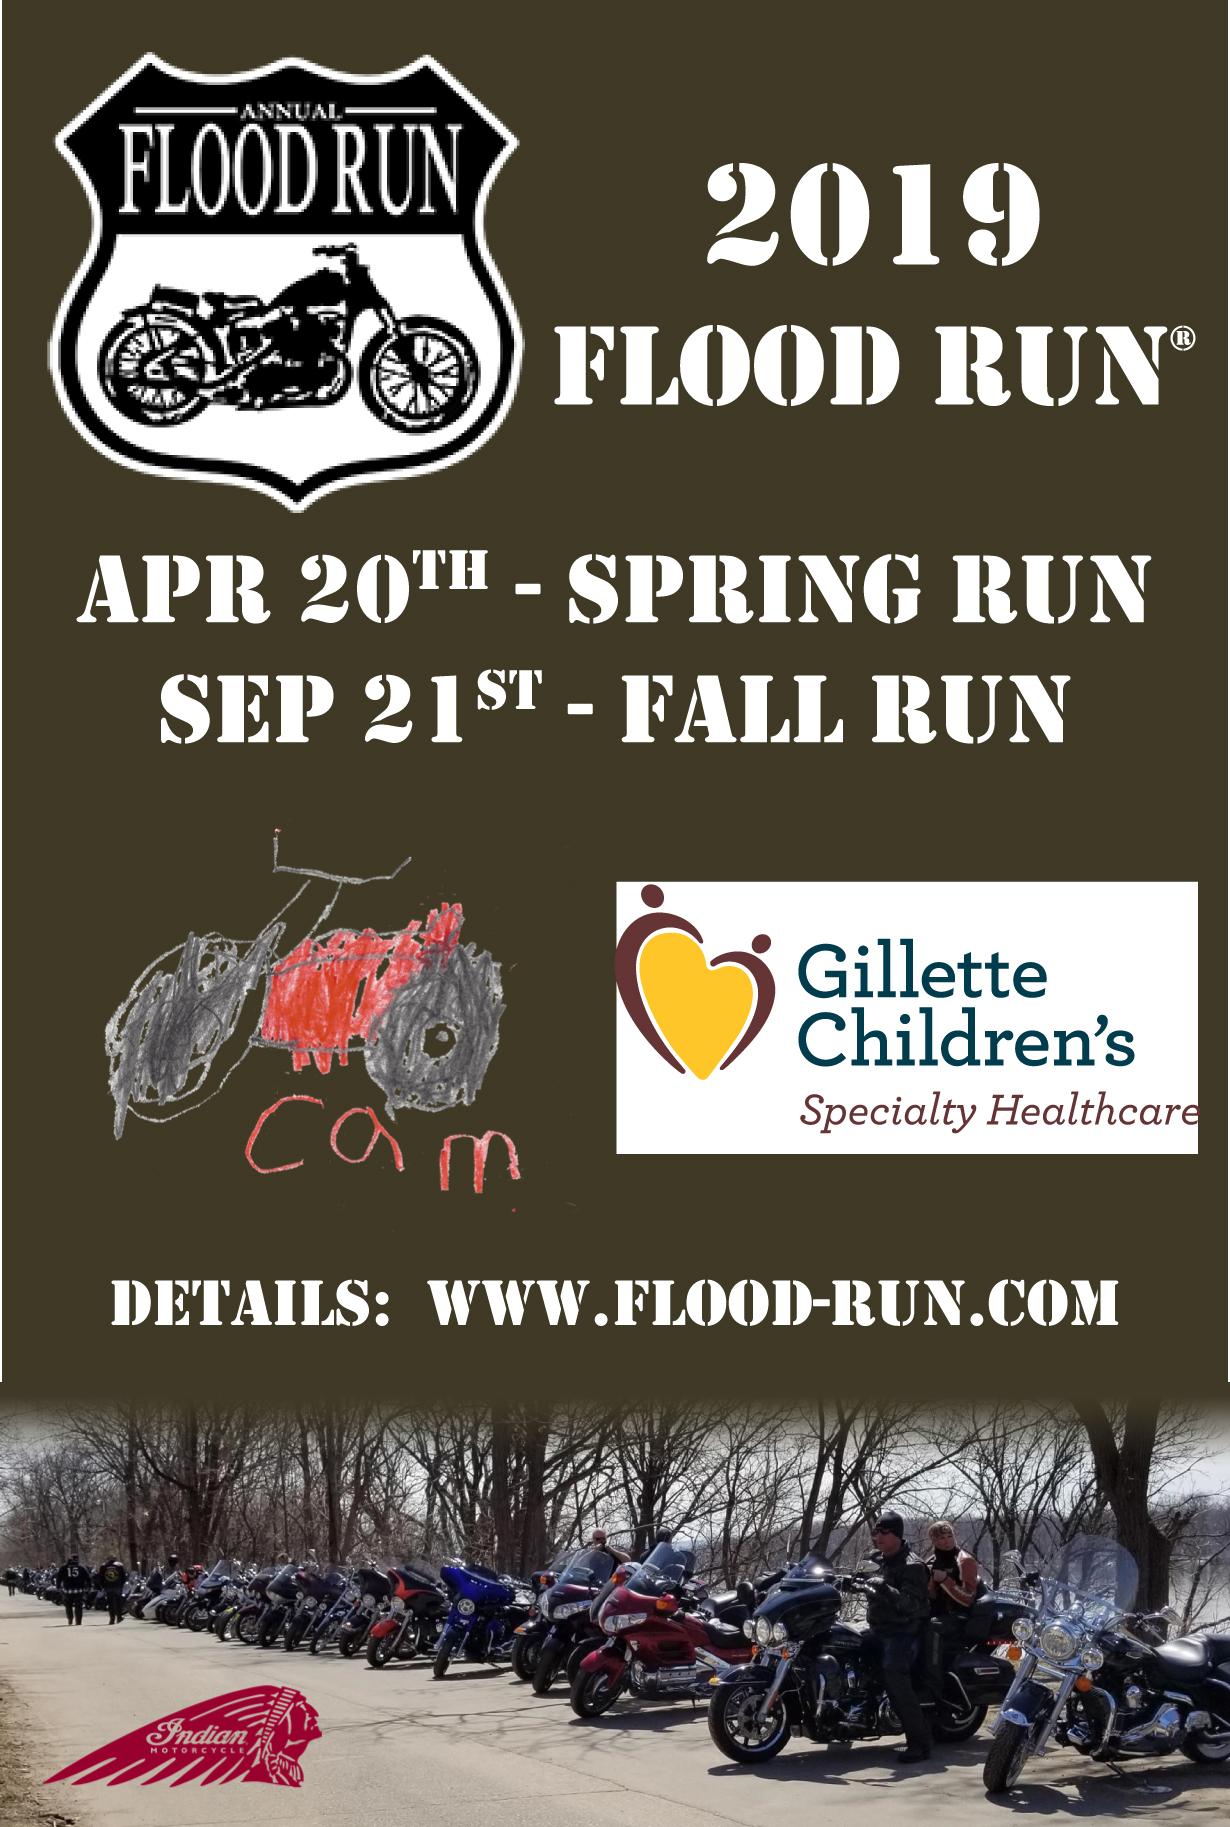 2019 Flood Run - Front postcard-4inx6in-v